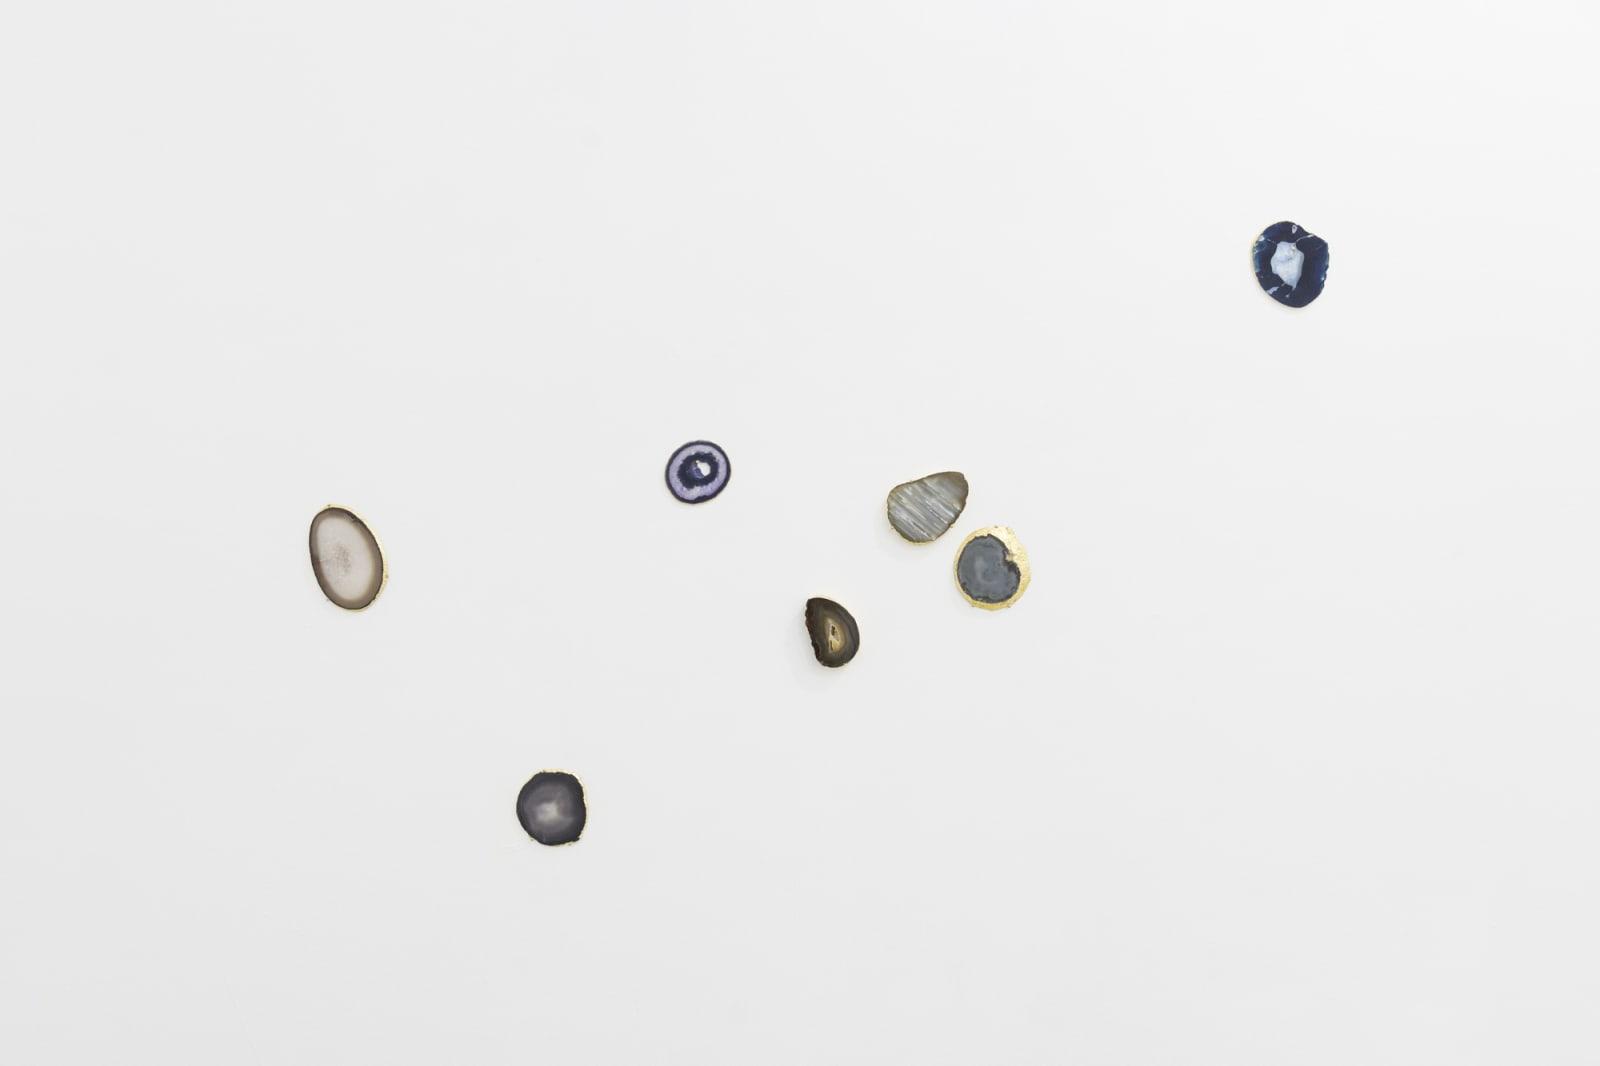 Giovanni Kronenberg, Untitled, 2020